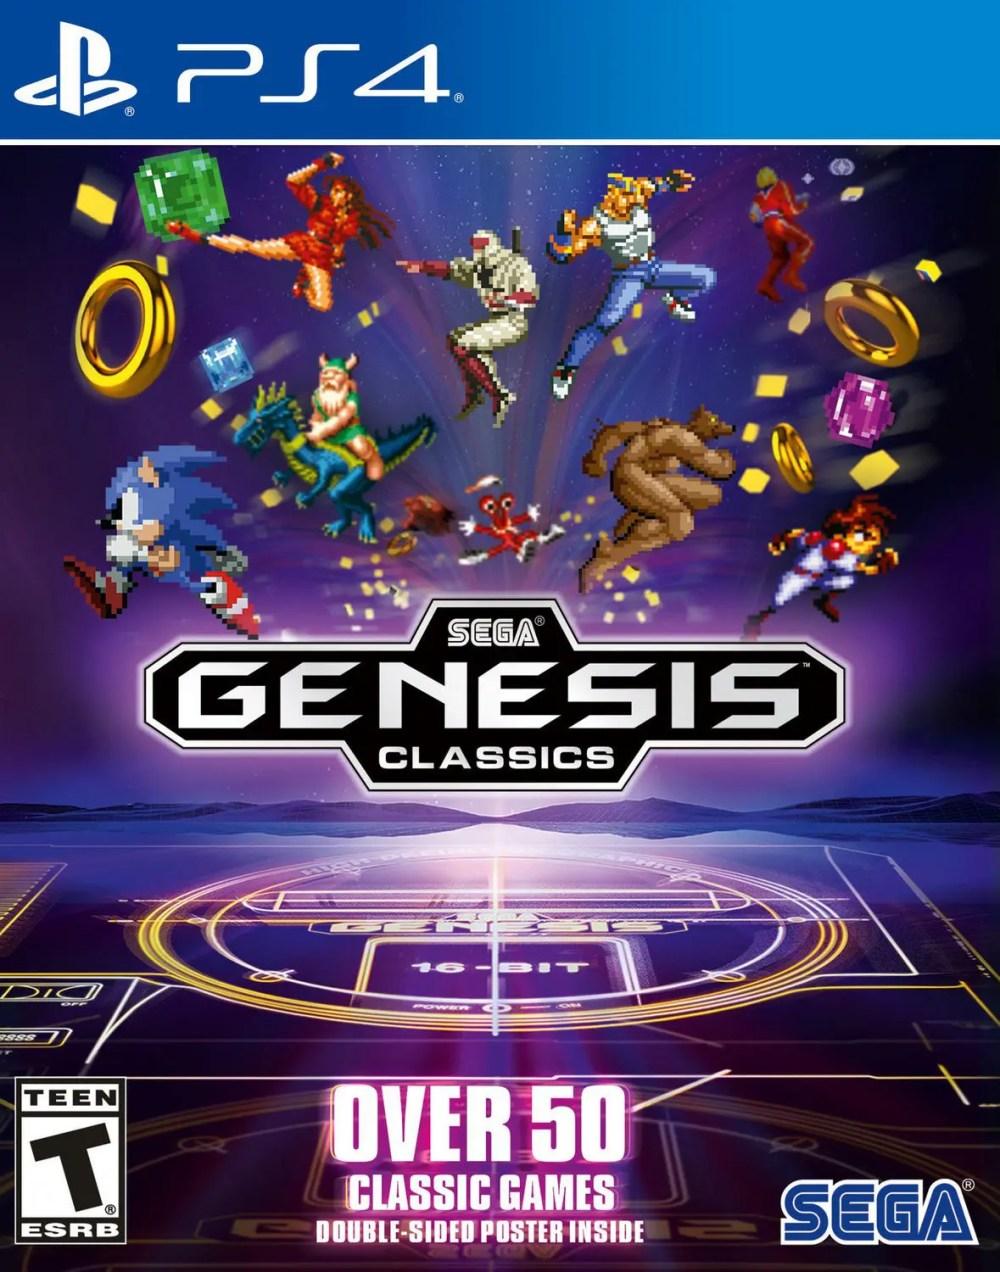 SEGA Genesis Classics for PS4